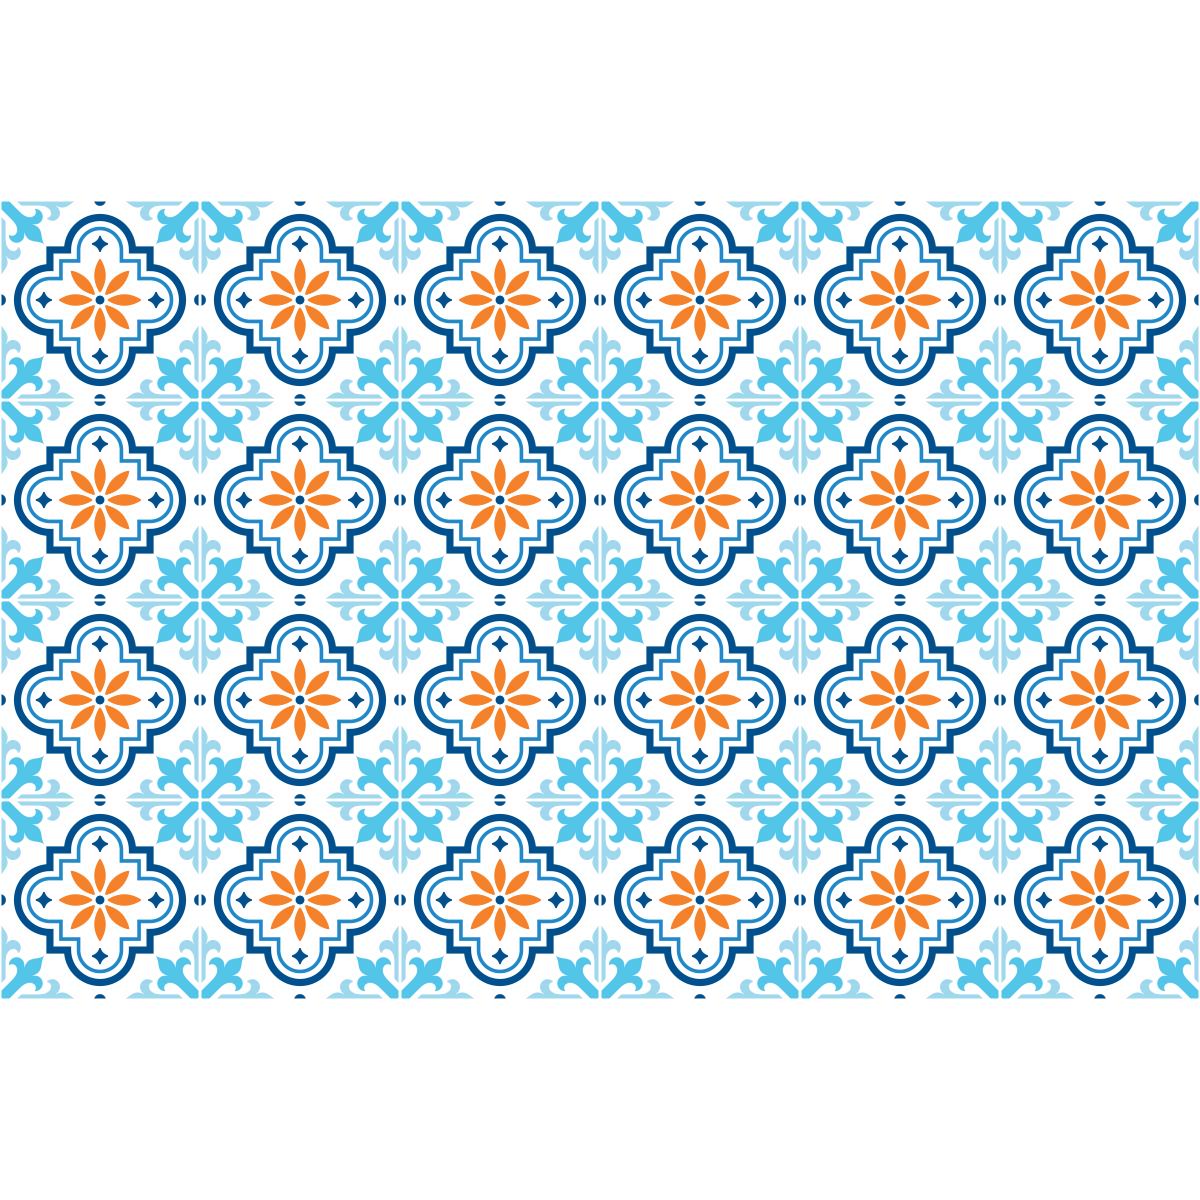 24 stickers carrelages azulejos ornements arabesque art et design artistiques ambiance sticker. Black Bedroom Furniture Sets. Home Design Ideas